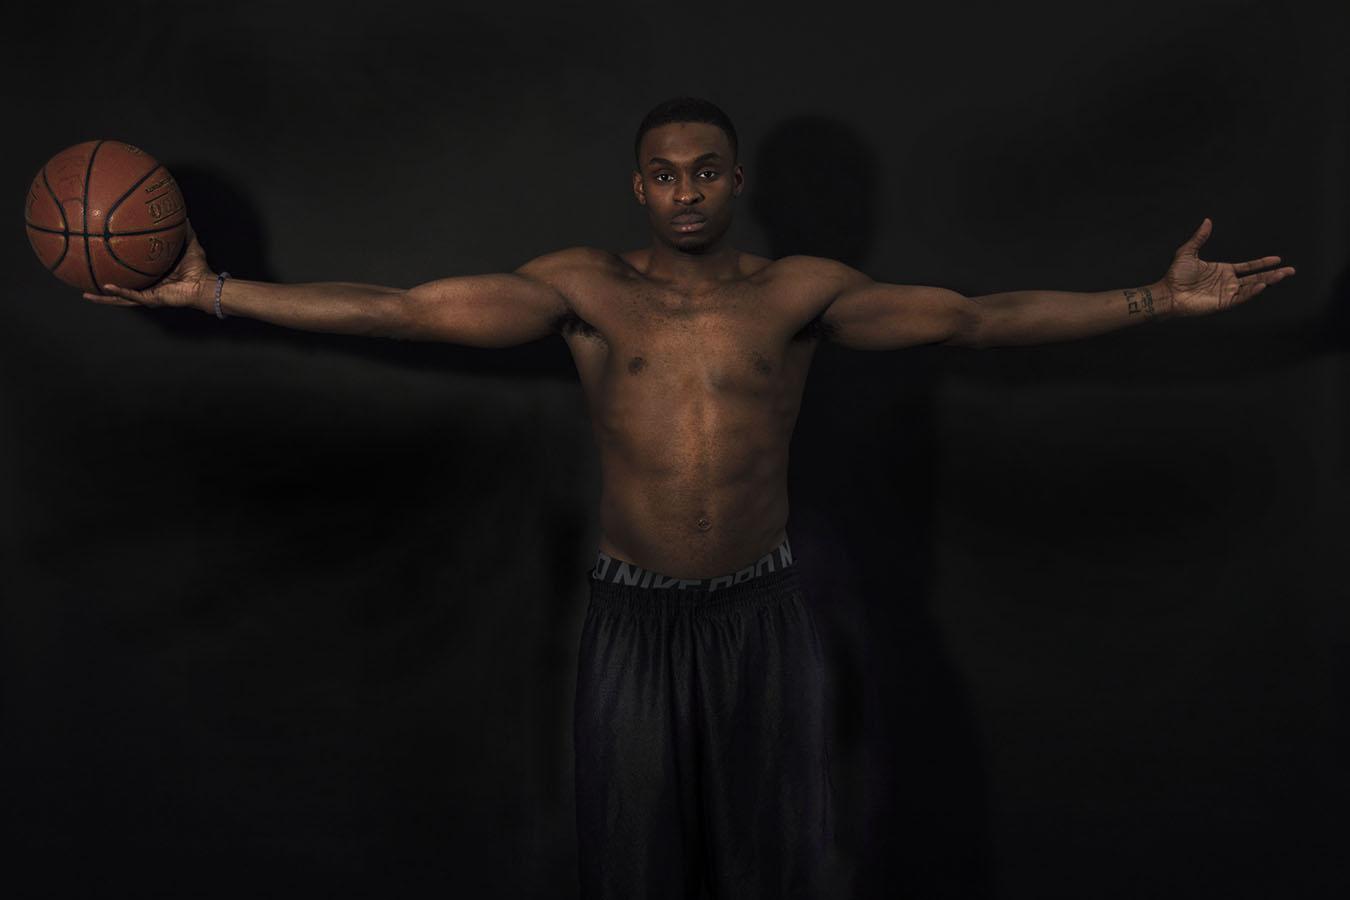 Soraya_Hebron_photography_tony_Hicks_portraiture_black_male_ivy_league_atheletes_basketball_players